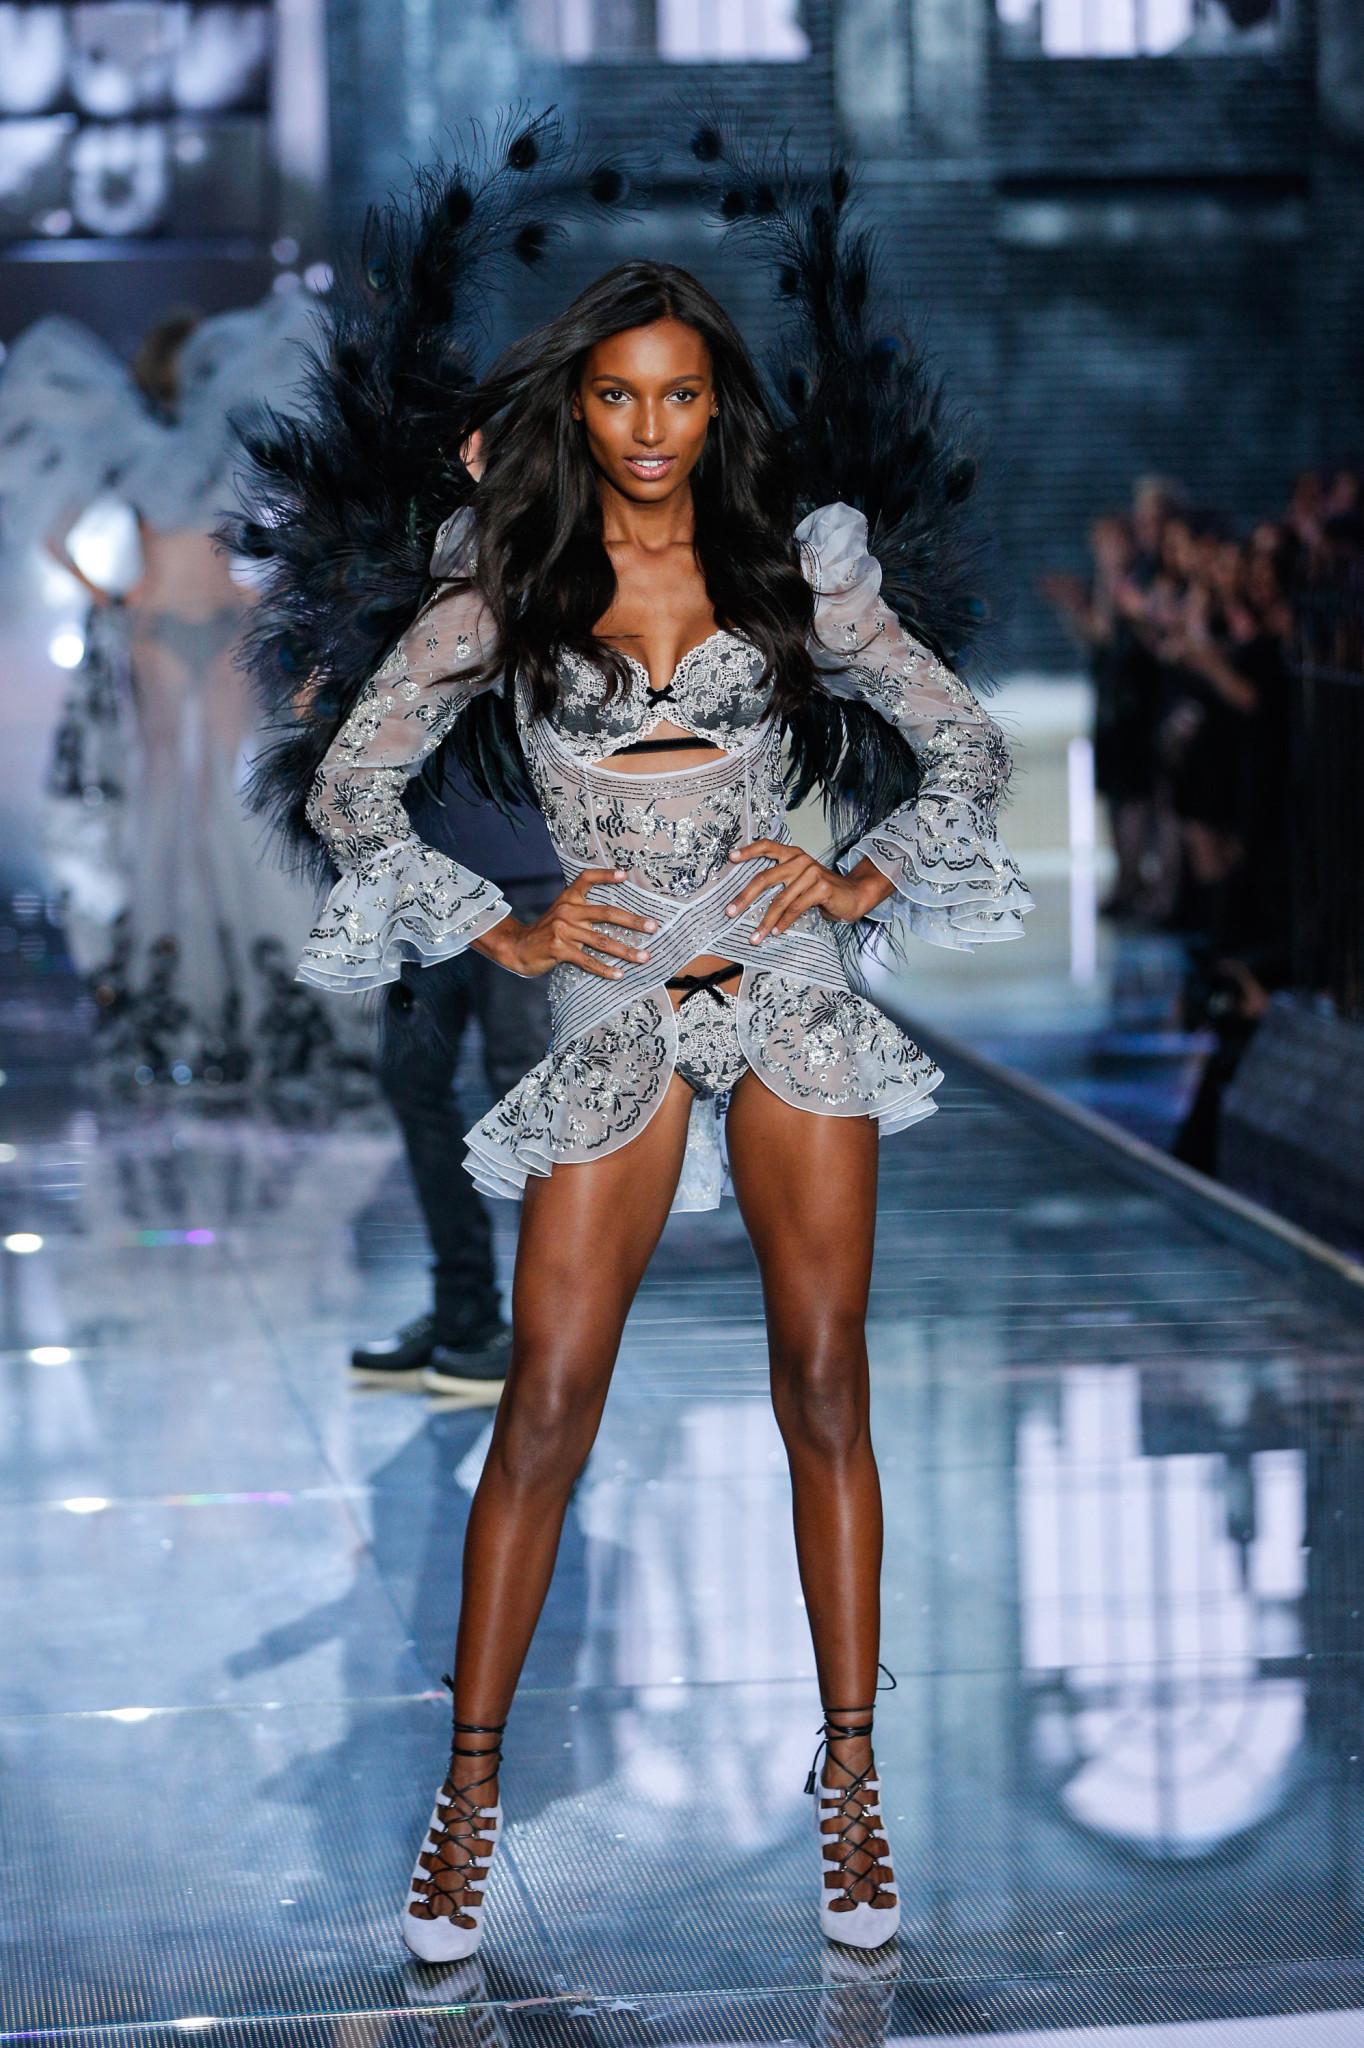 NEW YORK, NY - NOVEMBER 10: Model Jasmine Tookes walks the runway during the 2015 Victoria's Secret Fashion Show at Lexington Avenue Armory on November 10, 2015 in New York City.